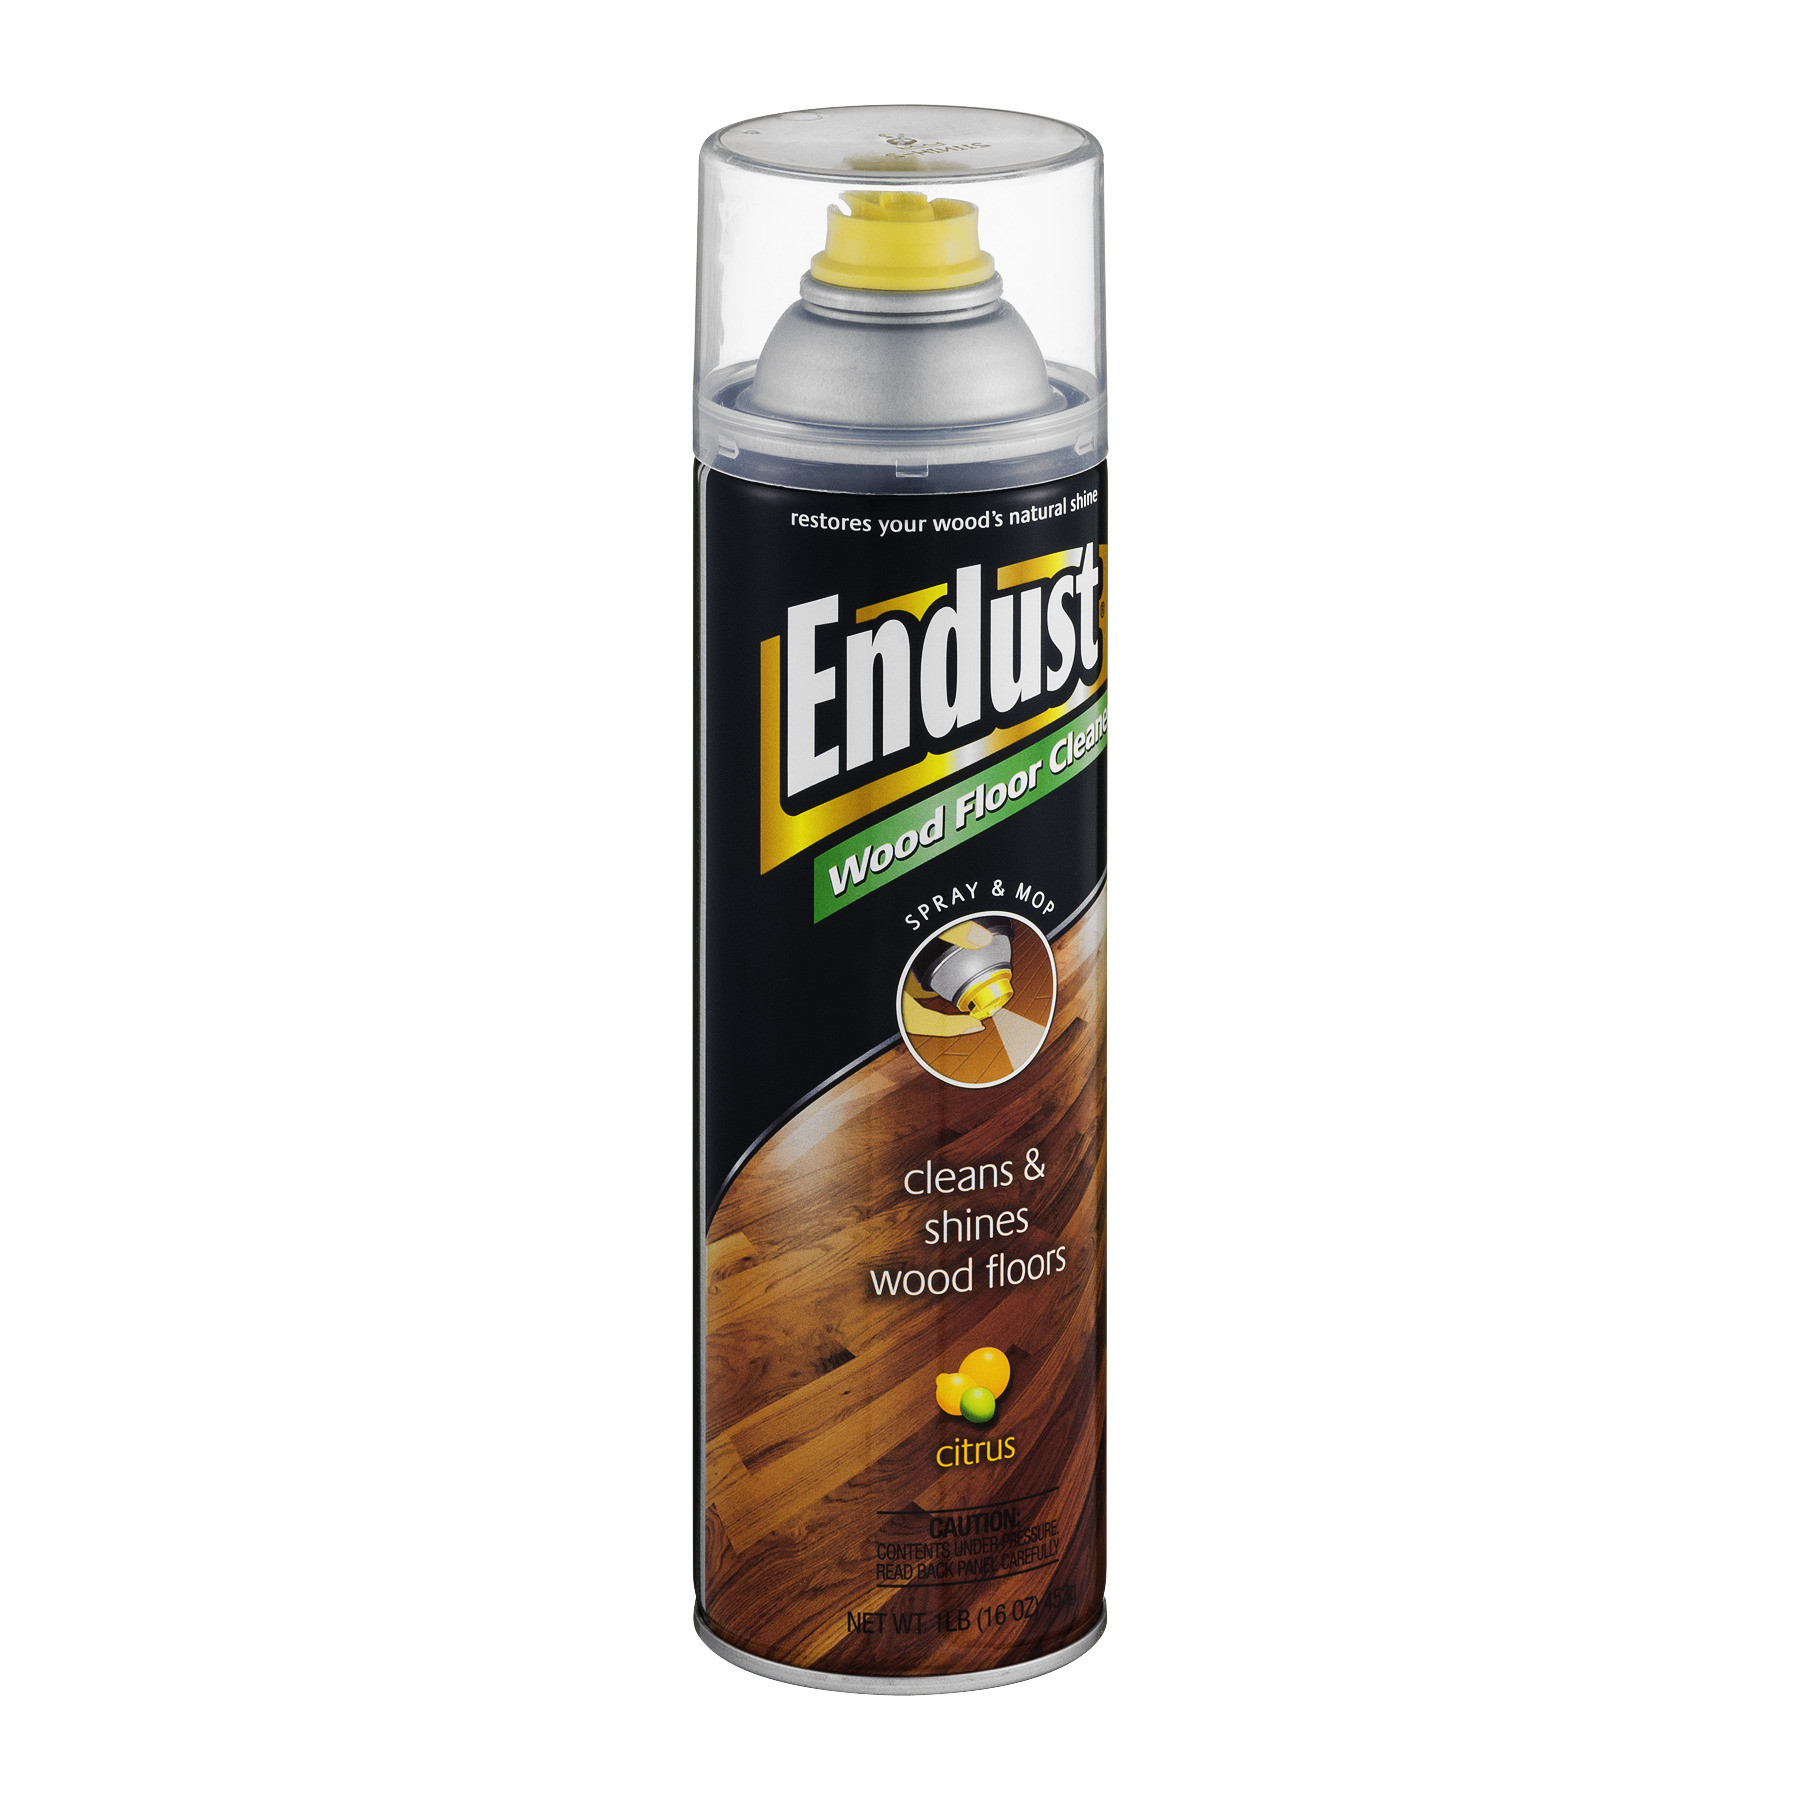 best sweeper for hardwood floors of endust citrus wood floor cleaner 16 oz walmart com in 6aa82809 ebe2 408e bdd2 c187658772c5 1 8ed41dfe4c578f8c36683d60de60209a